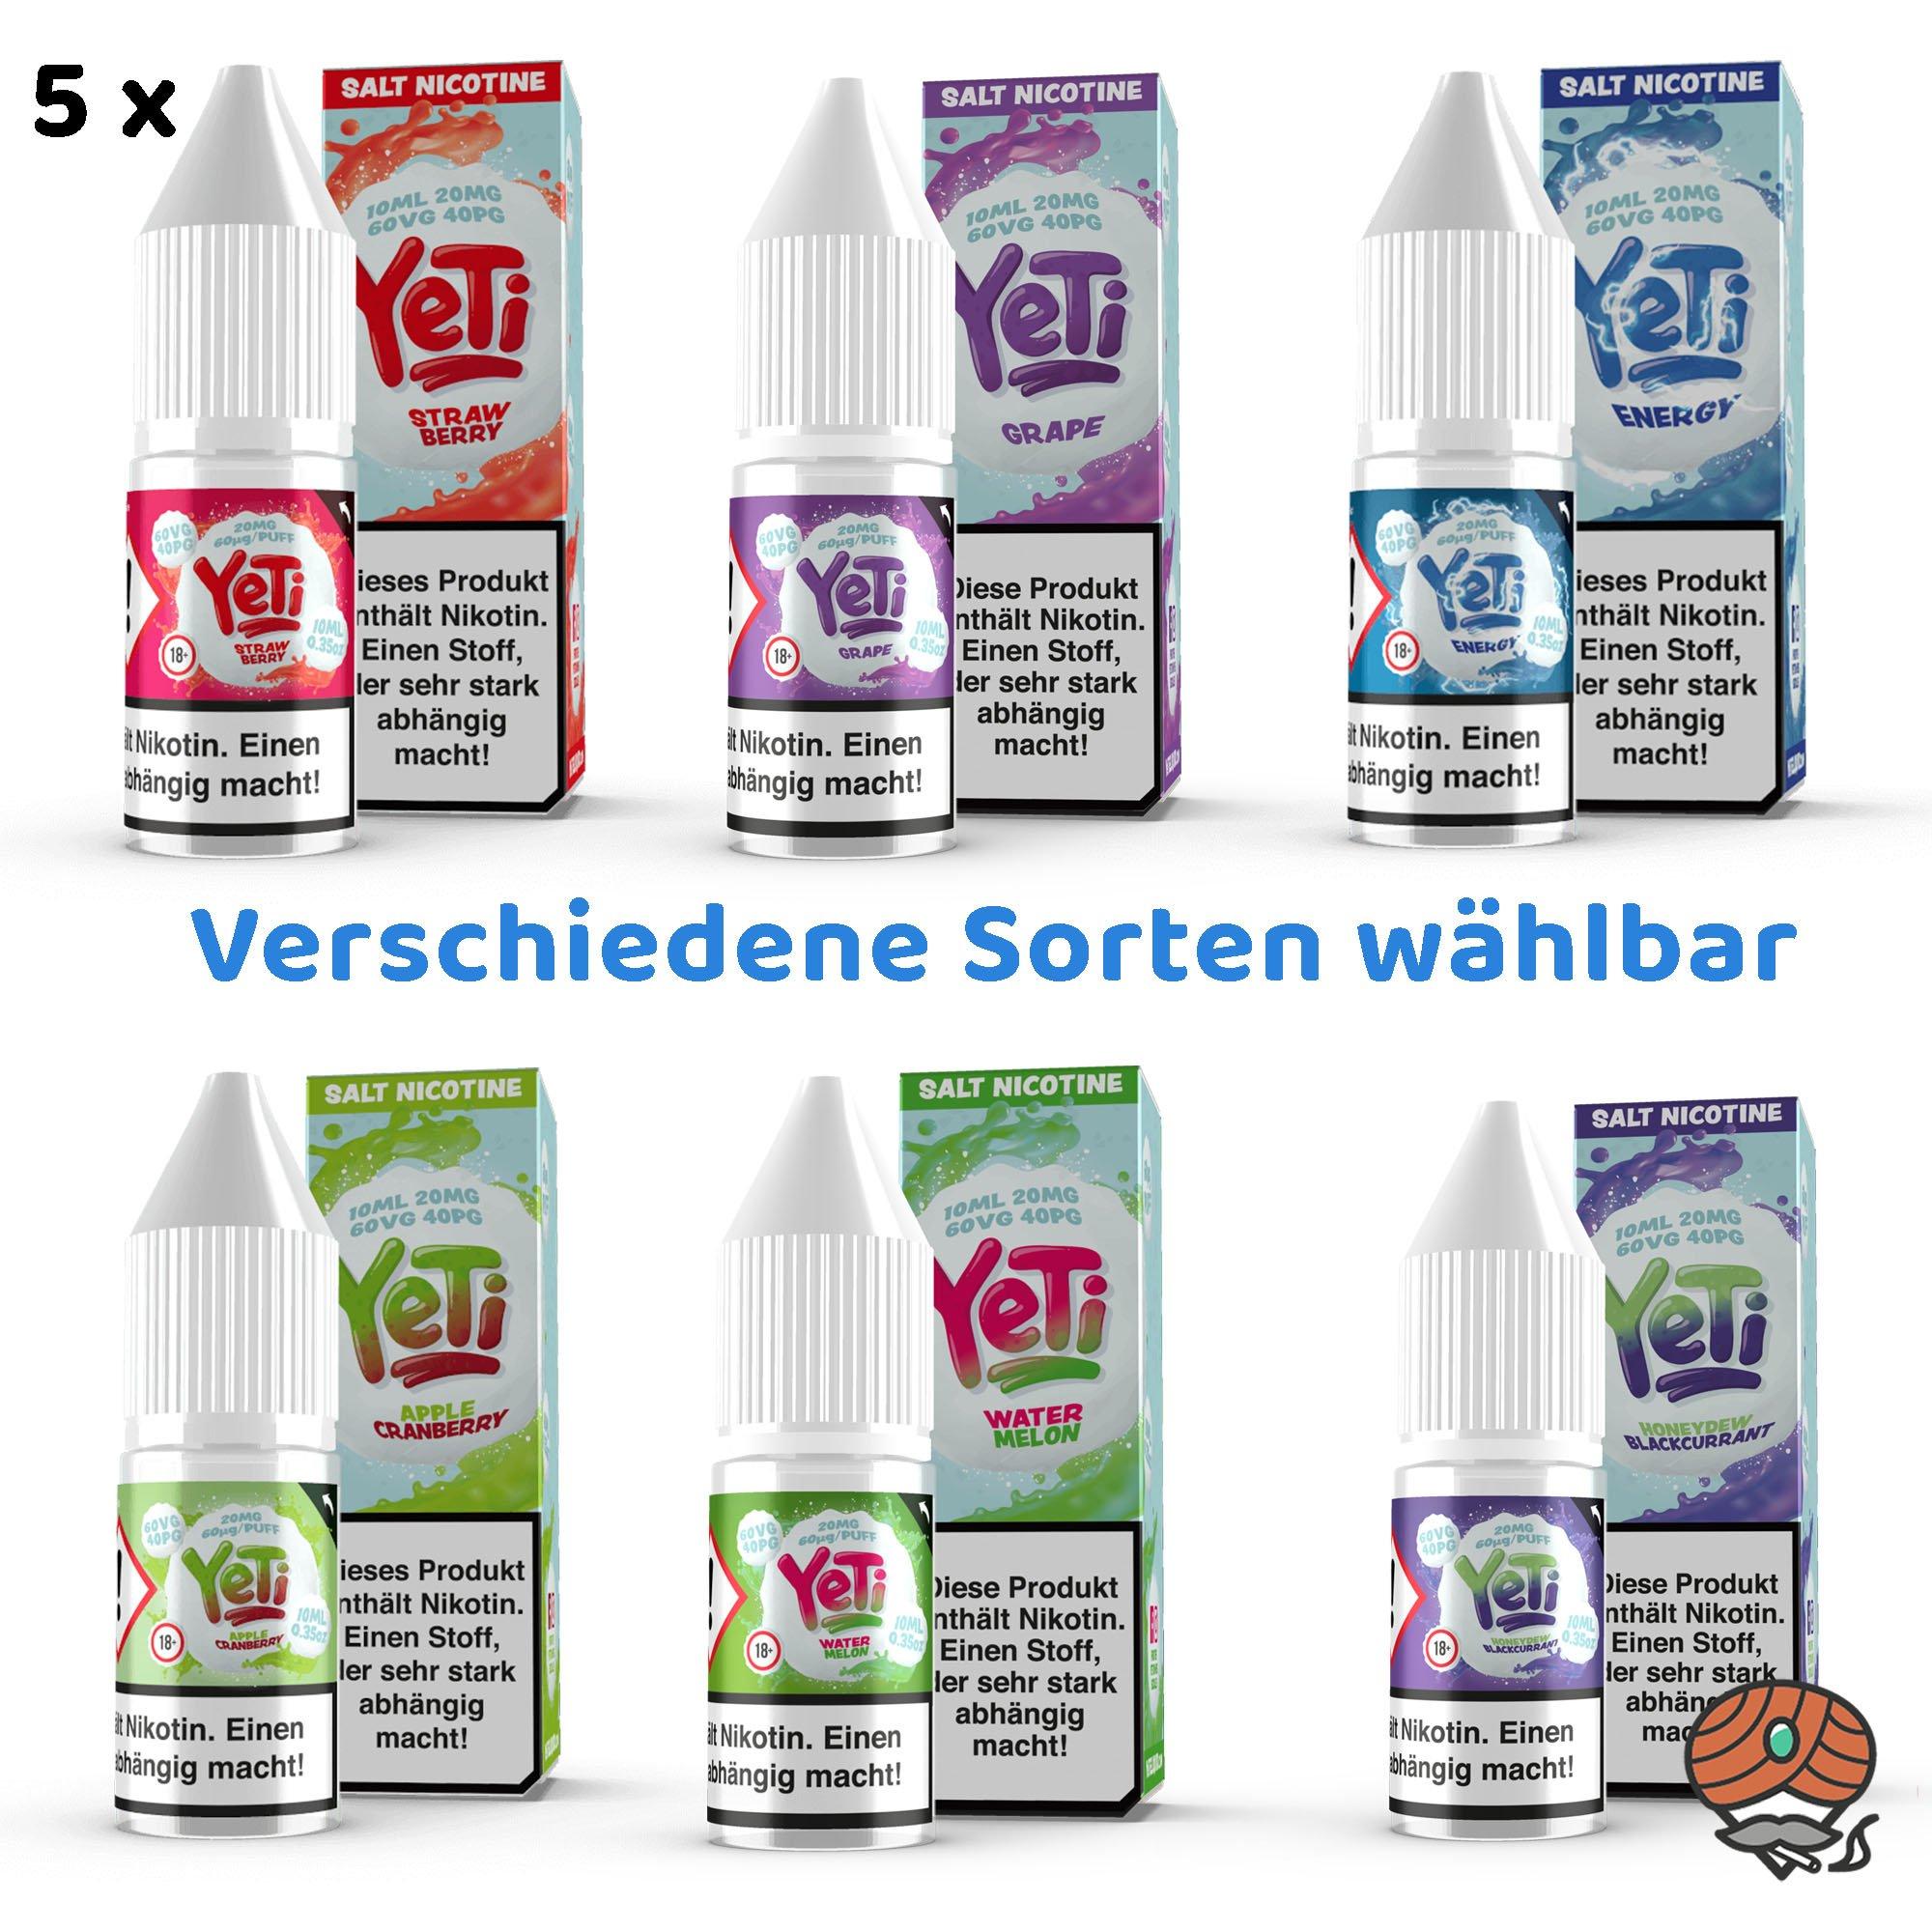 5 x YeTi Nikotinsalz Liquid 10 ml 20 mg/ml Nikotin alle Sorten wählbar